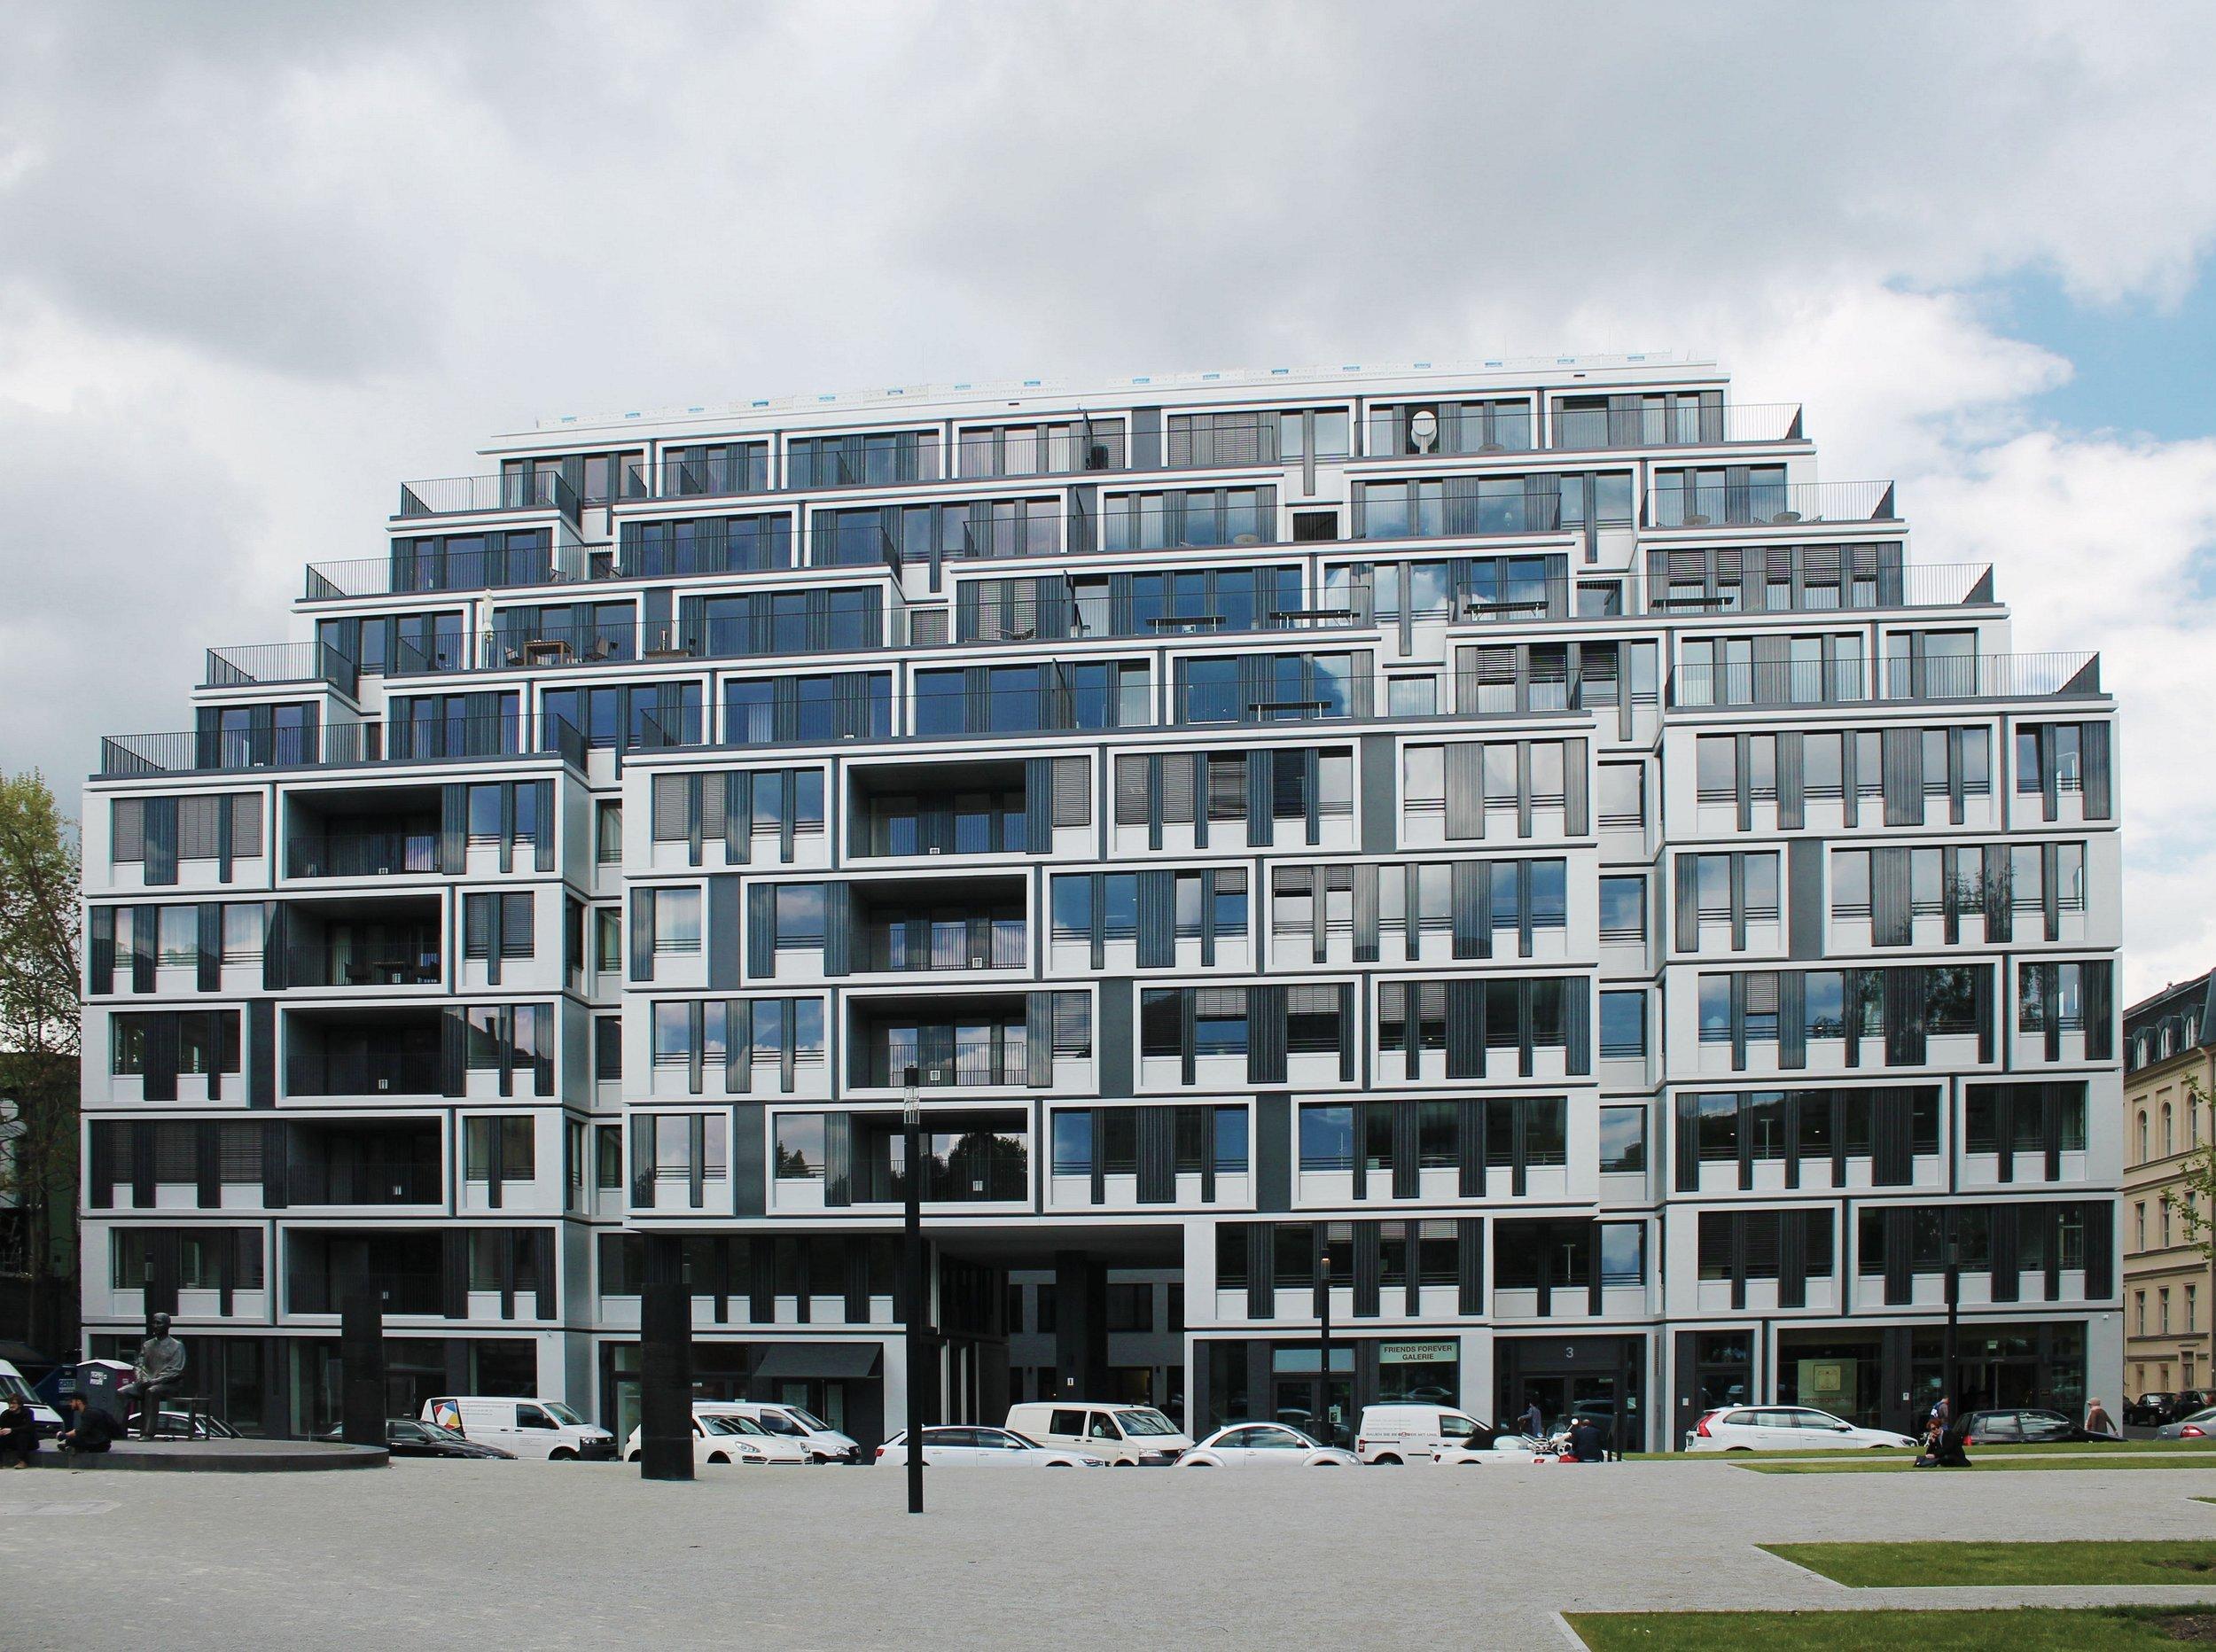 Yoo am Zirkus, Berlin /Eike Becker Architekten GmbH, Berlin